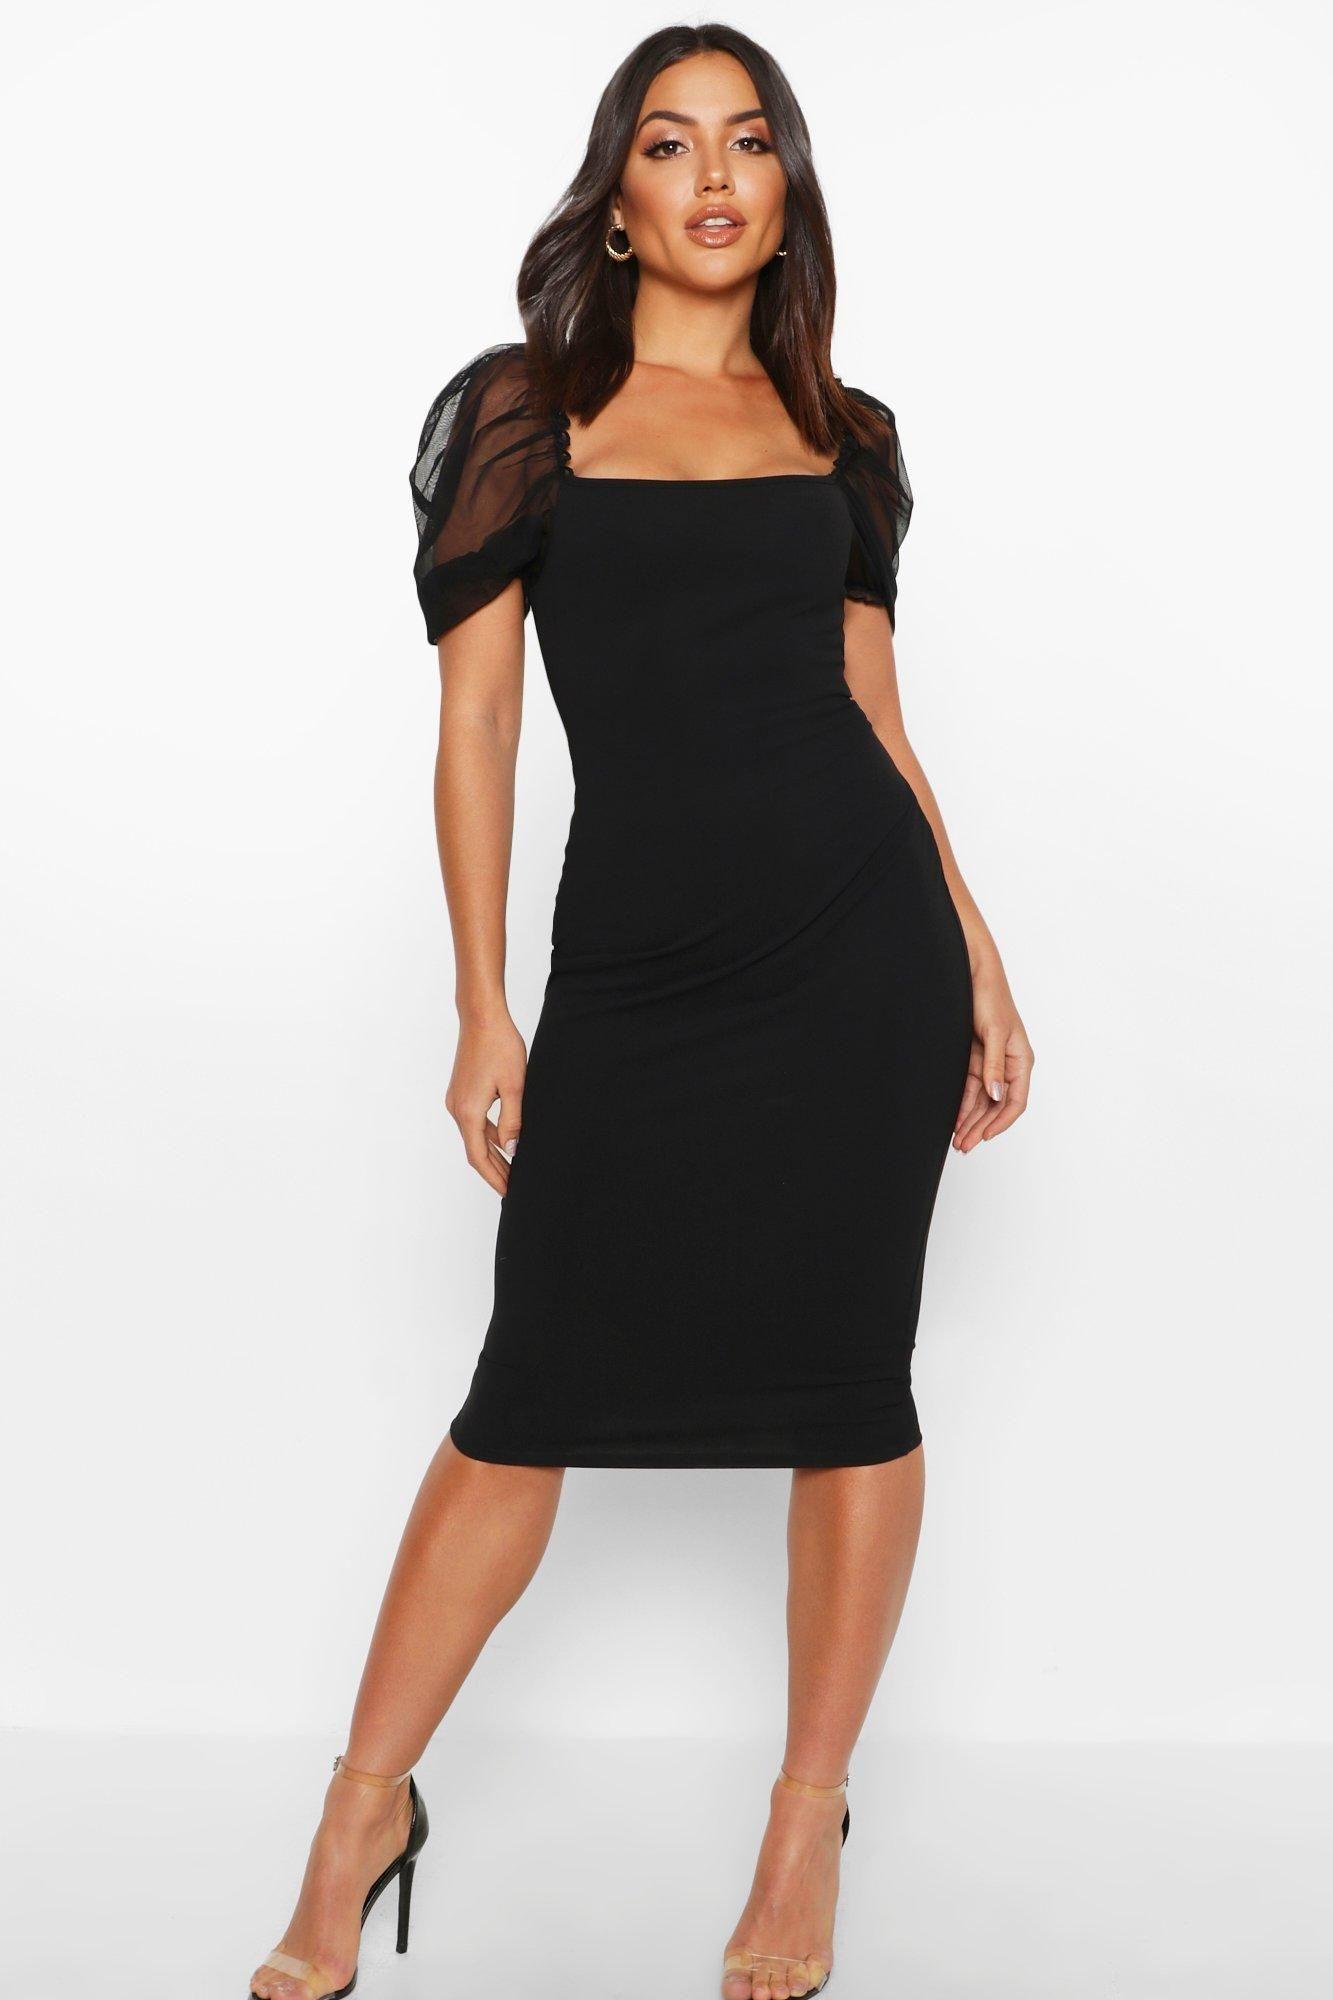 Home Black Dresses Classy Little Black Dress Classy Midi Dress With Sleeves [ 2000 x 1333 Pixel ]